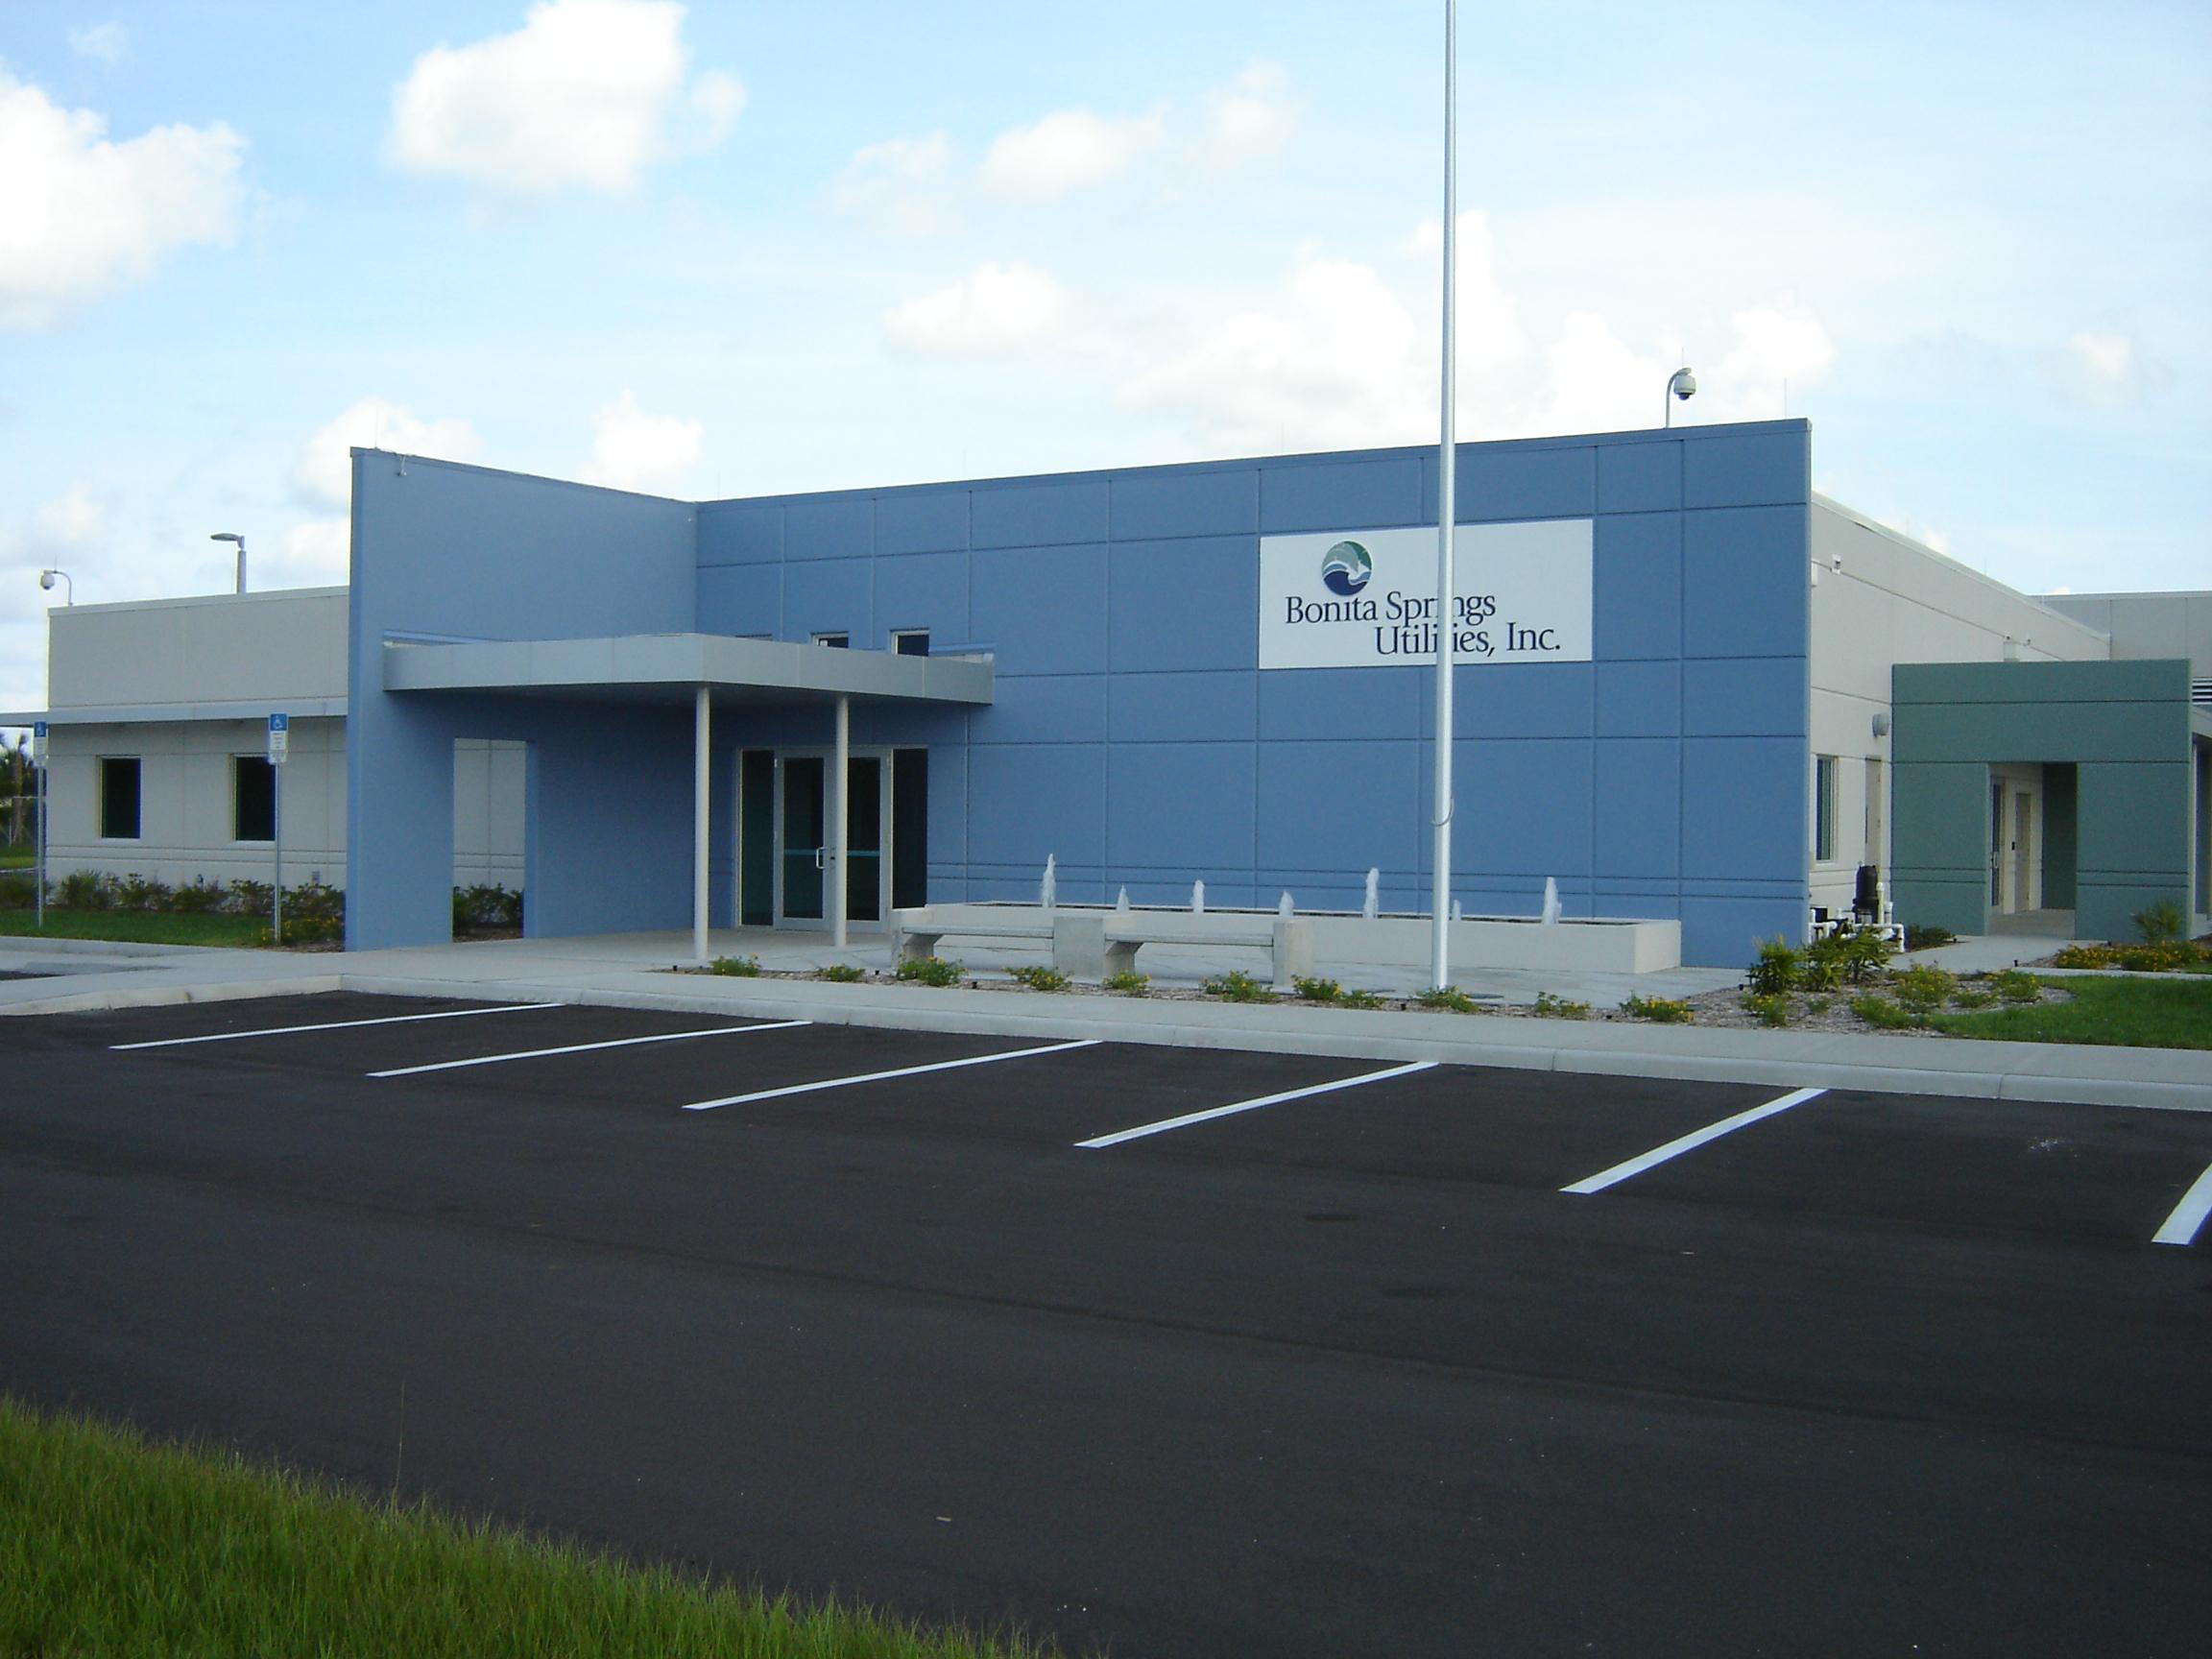 2009 Lee Building Industry Association Summit Award